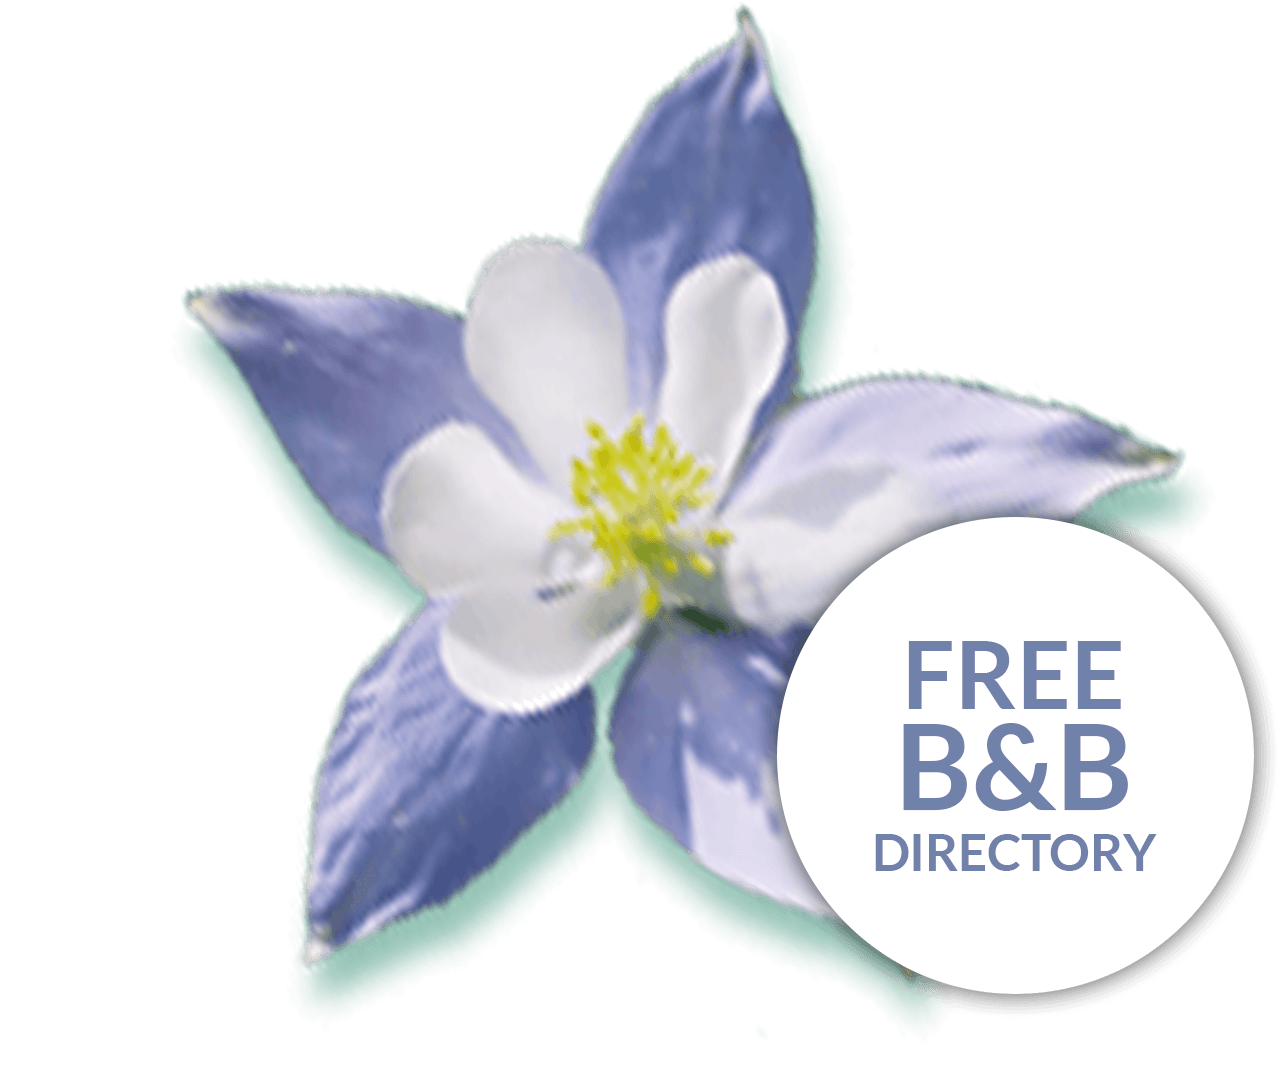 Free B&B Directory - Bed & breakfasts & inns of Colorado Association